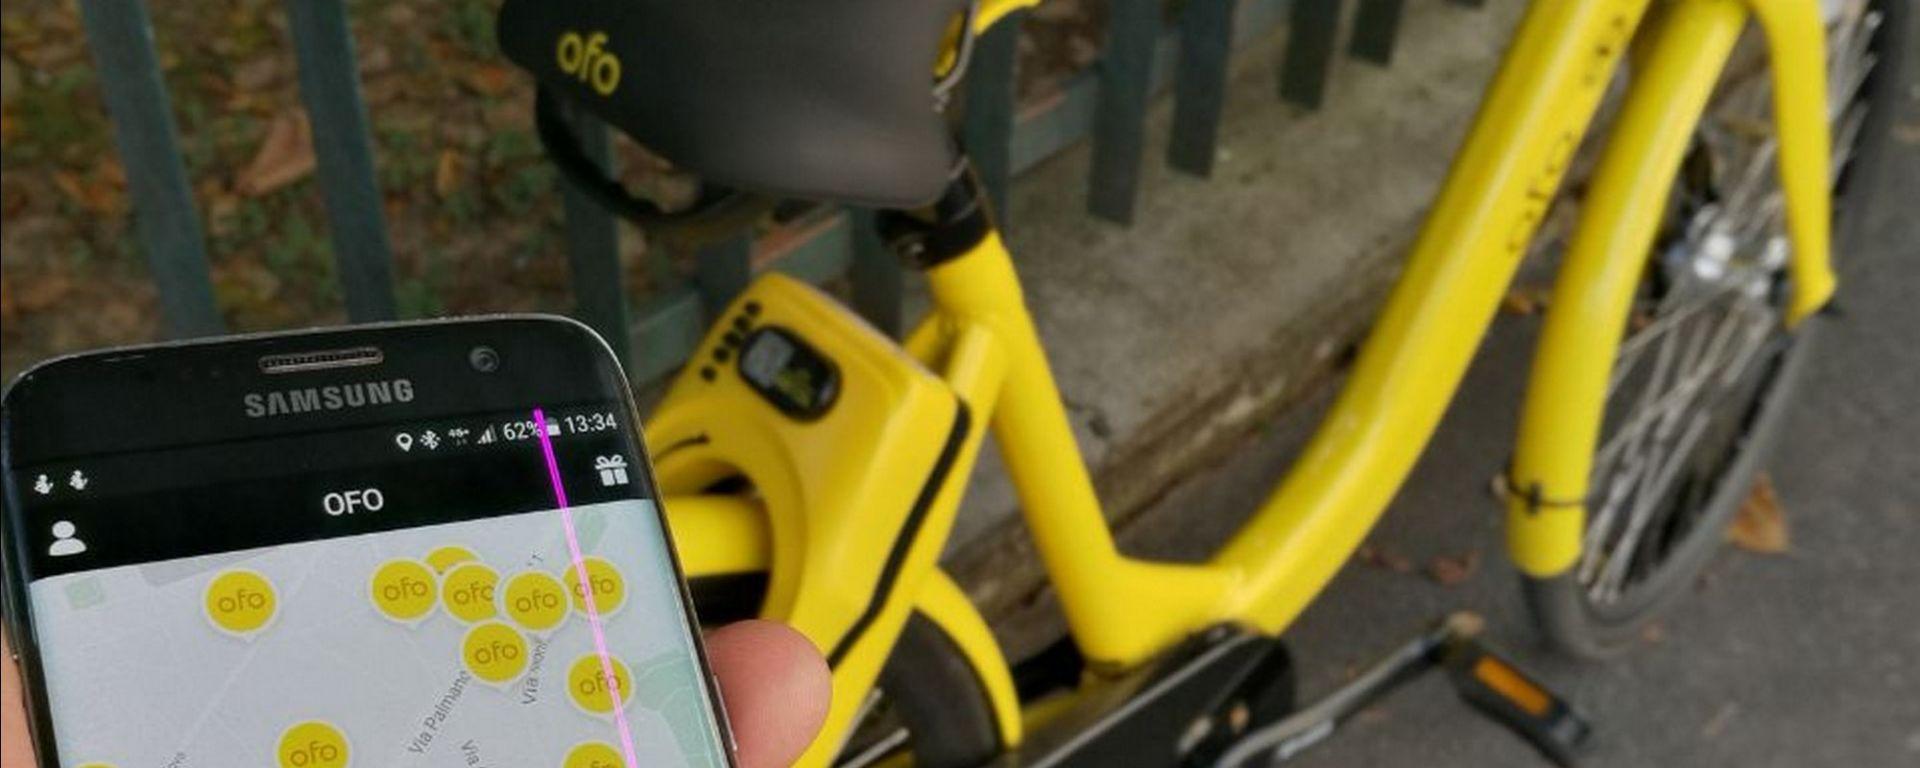 Ofo, nuovo bike-sharing a Milano